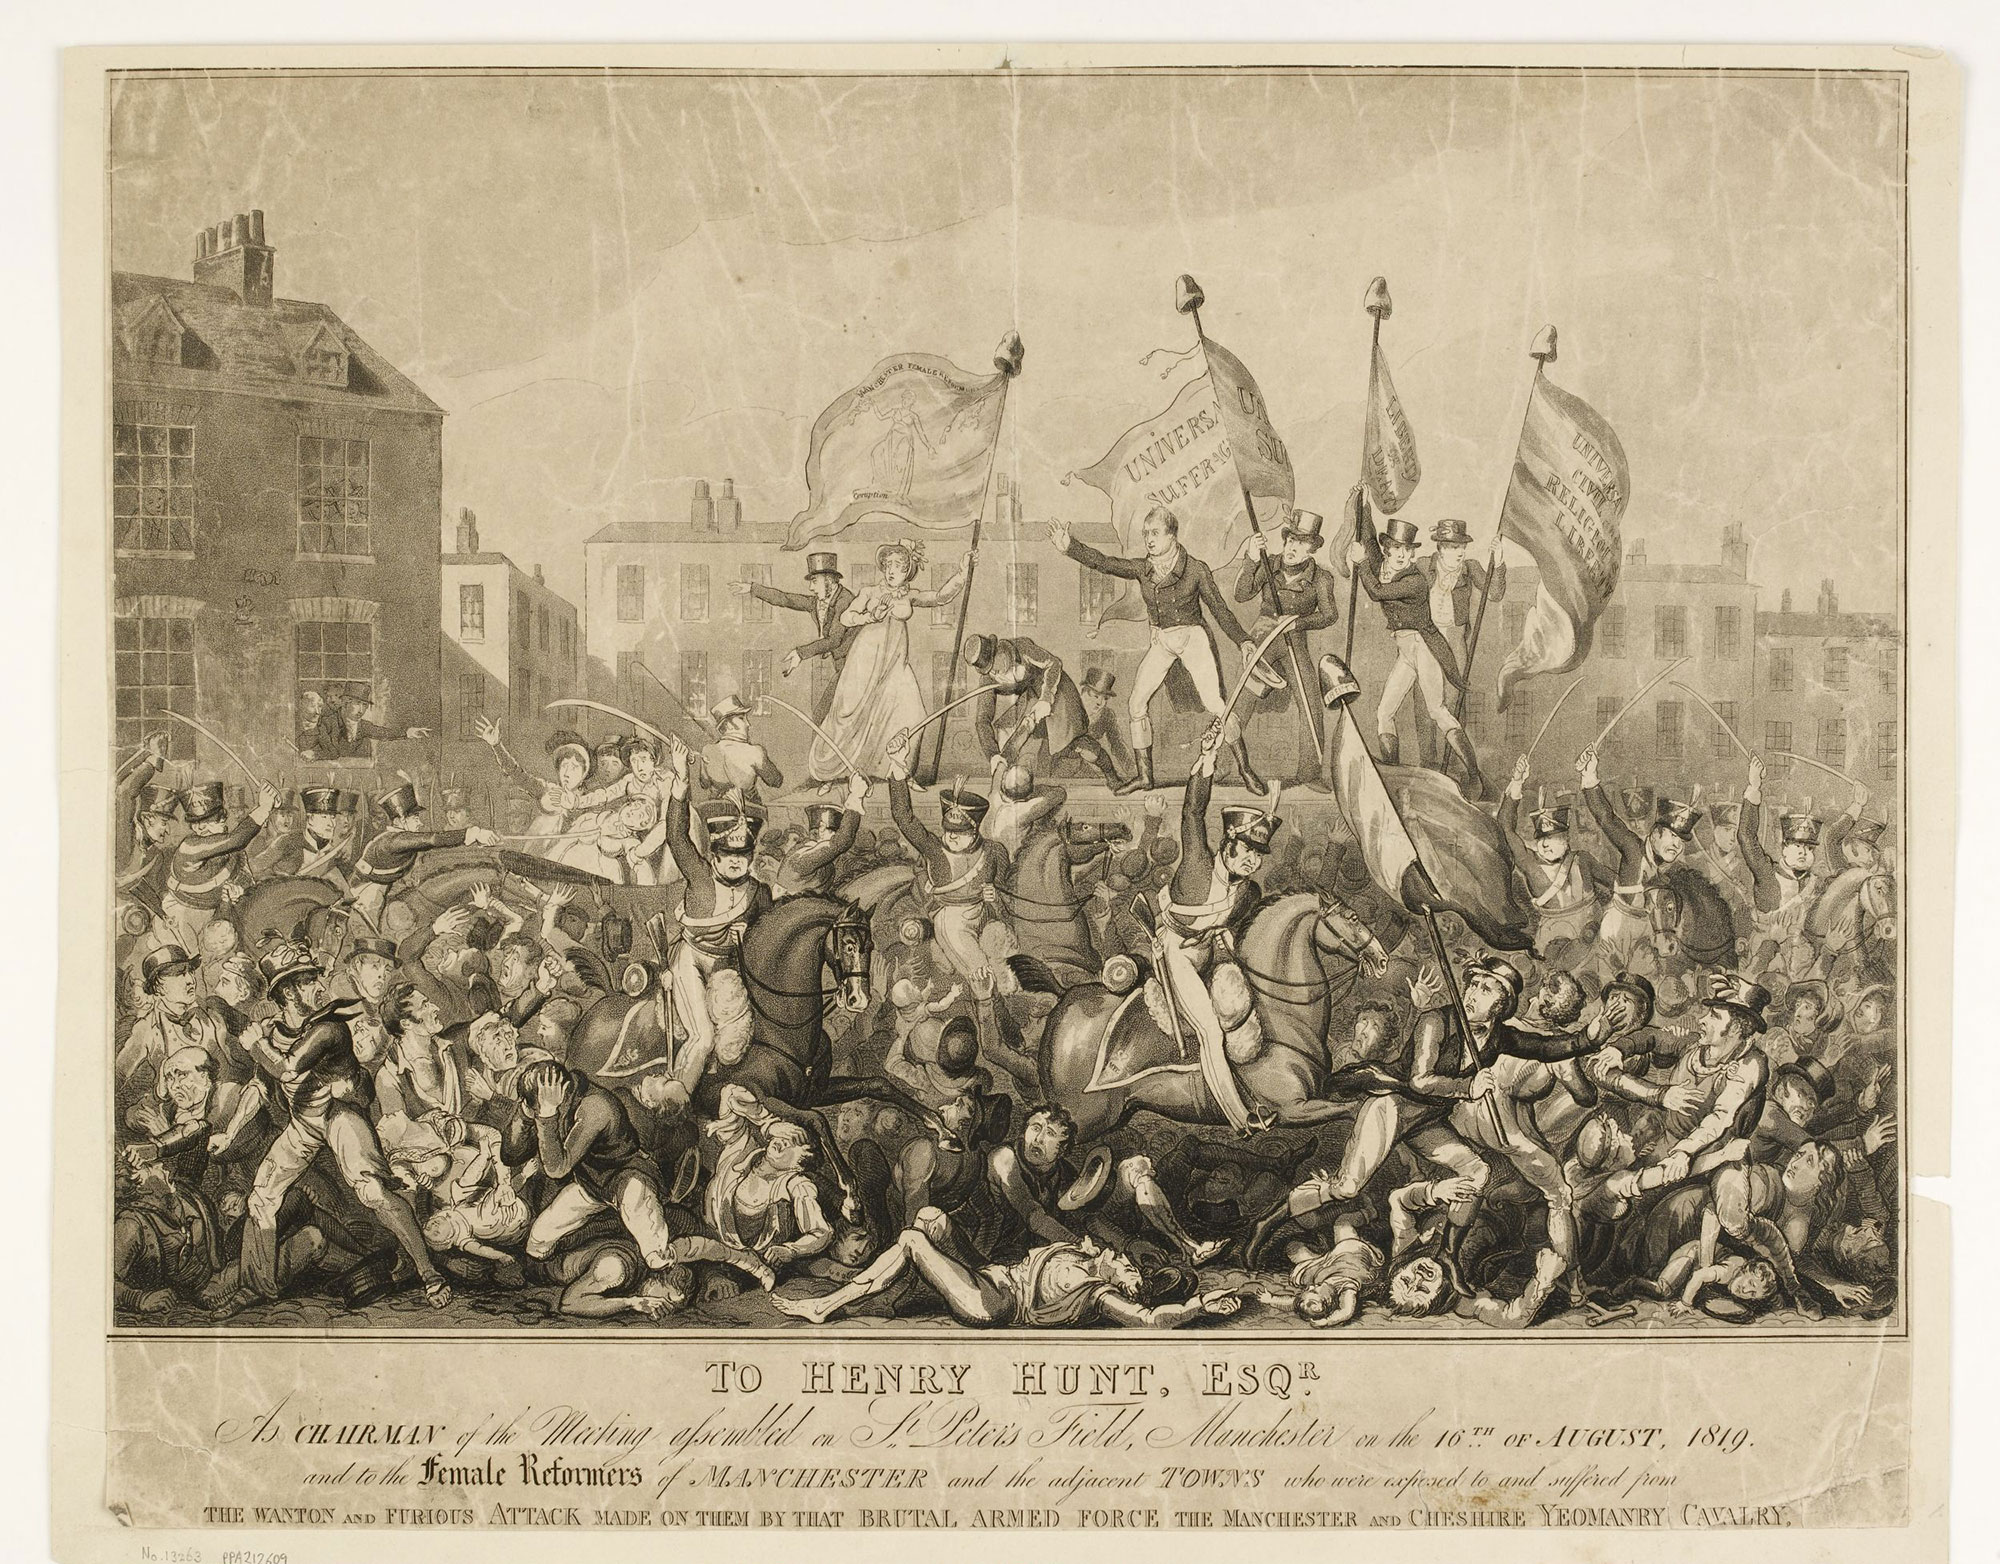 Print depicting the Peterloo Massacre